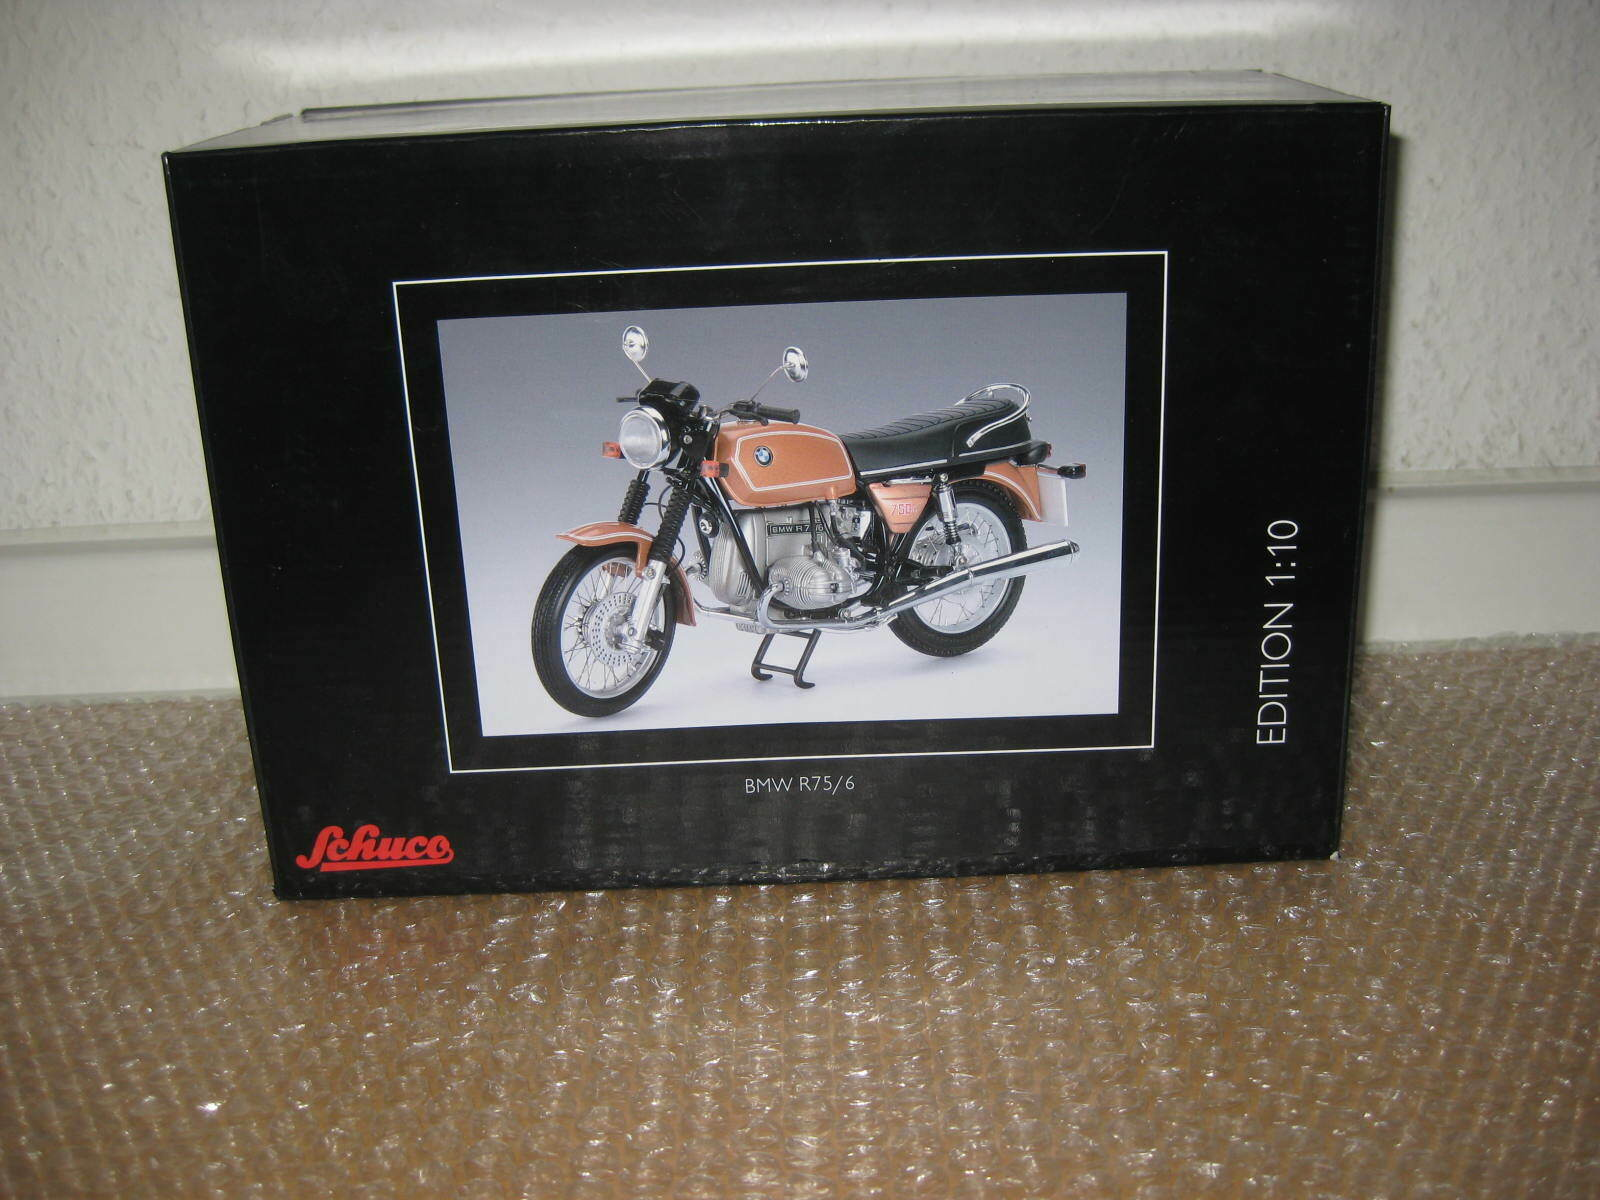 Schuco moto 1 10 bmw r75 6 nr.450656300 s527